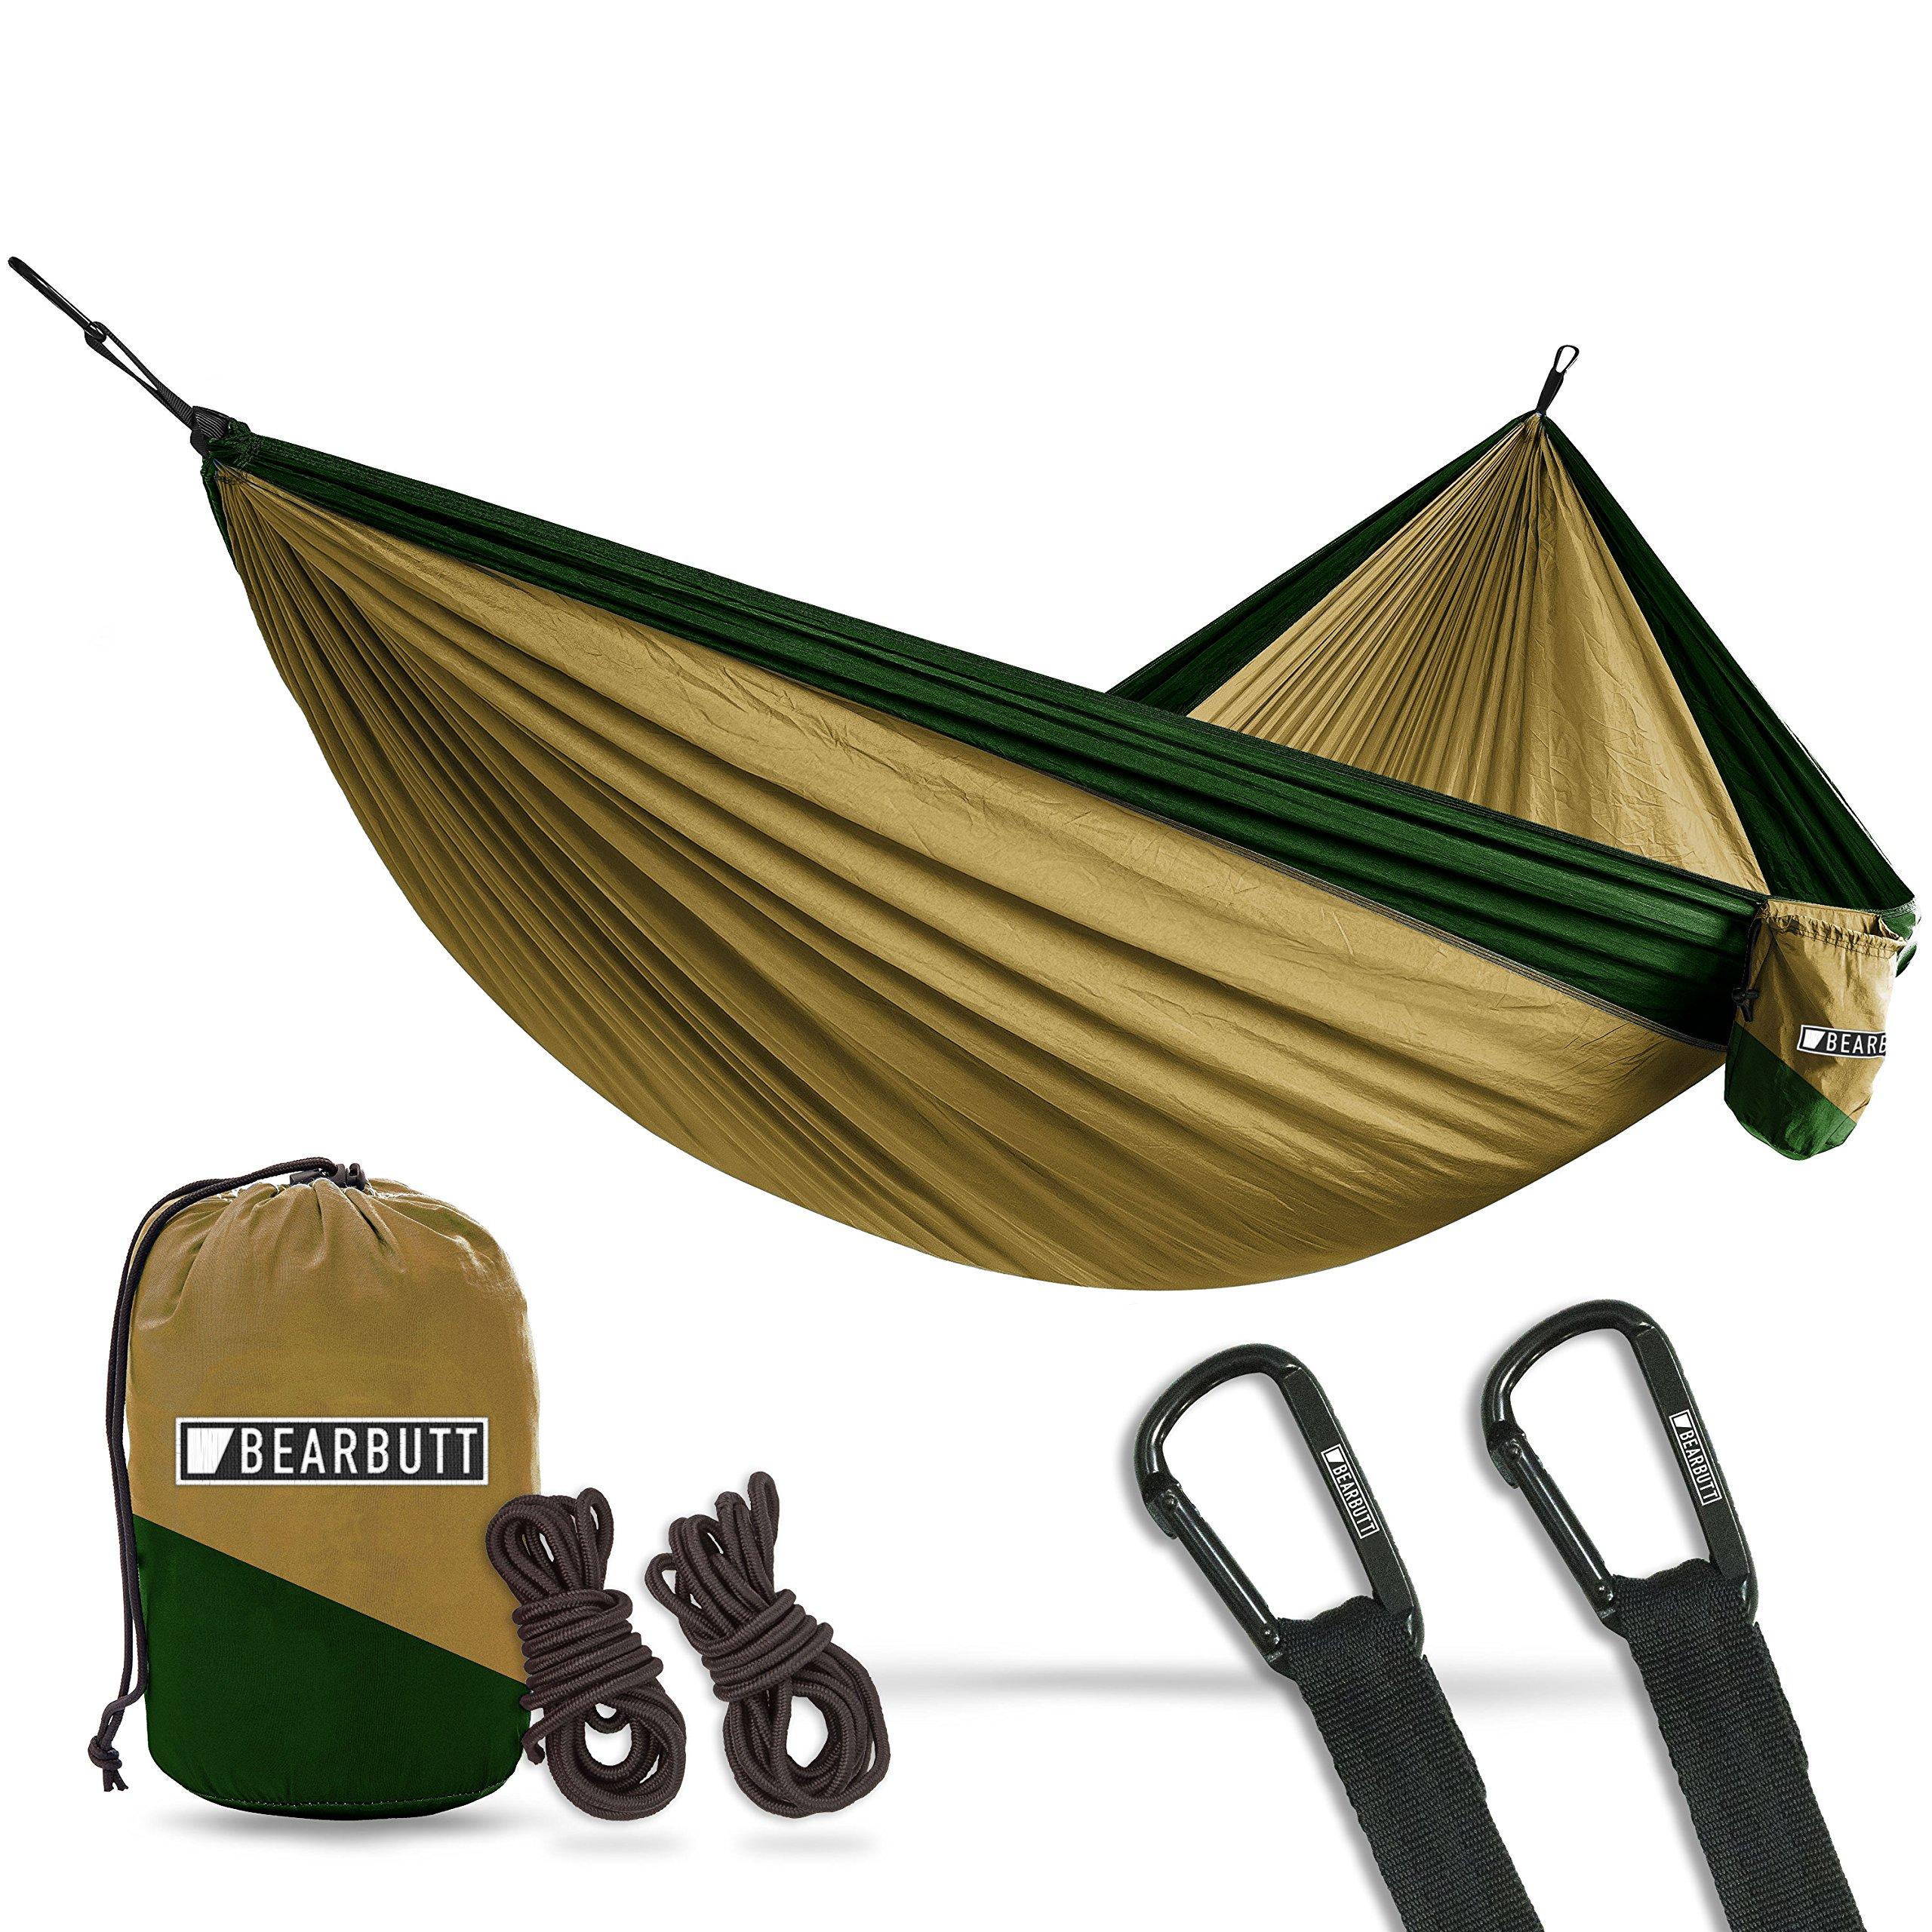 Bear Butt Double Parachute Hammock - Khaki/Dark Green